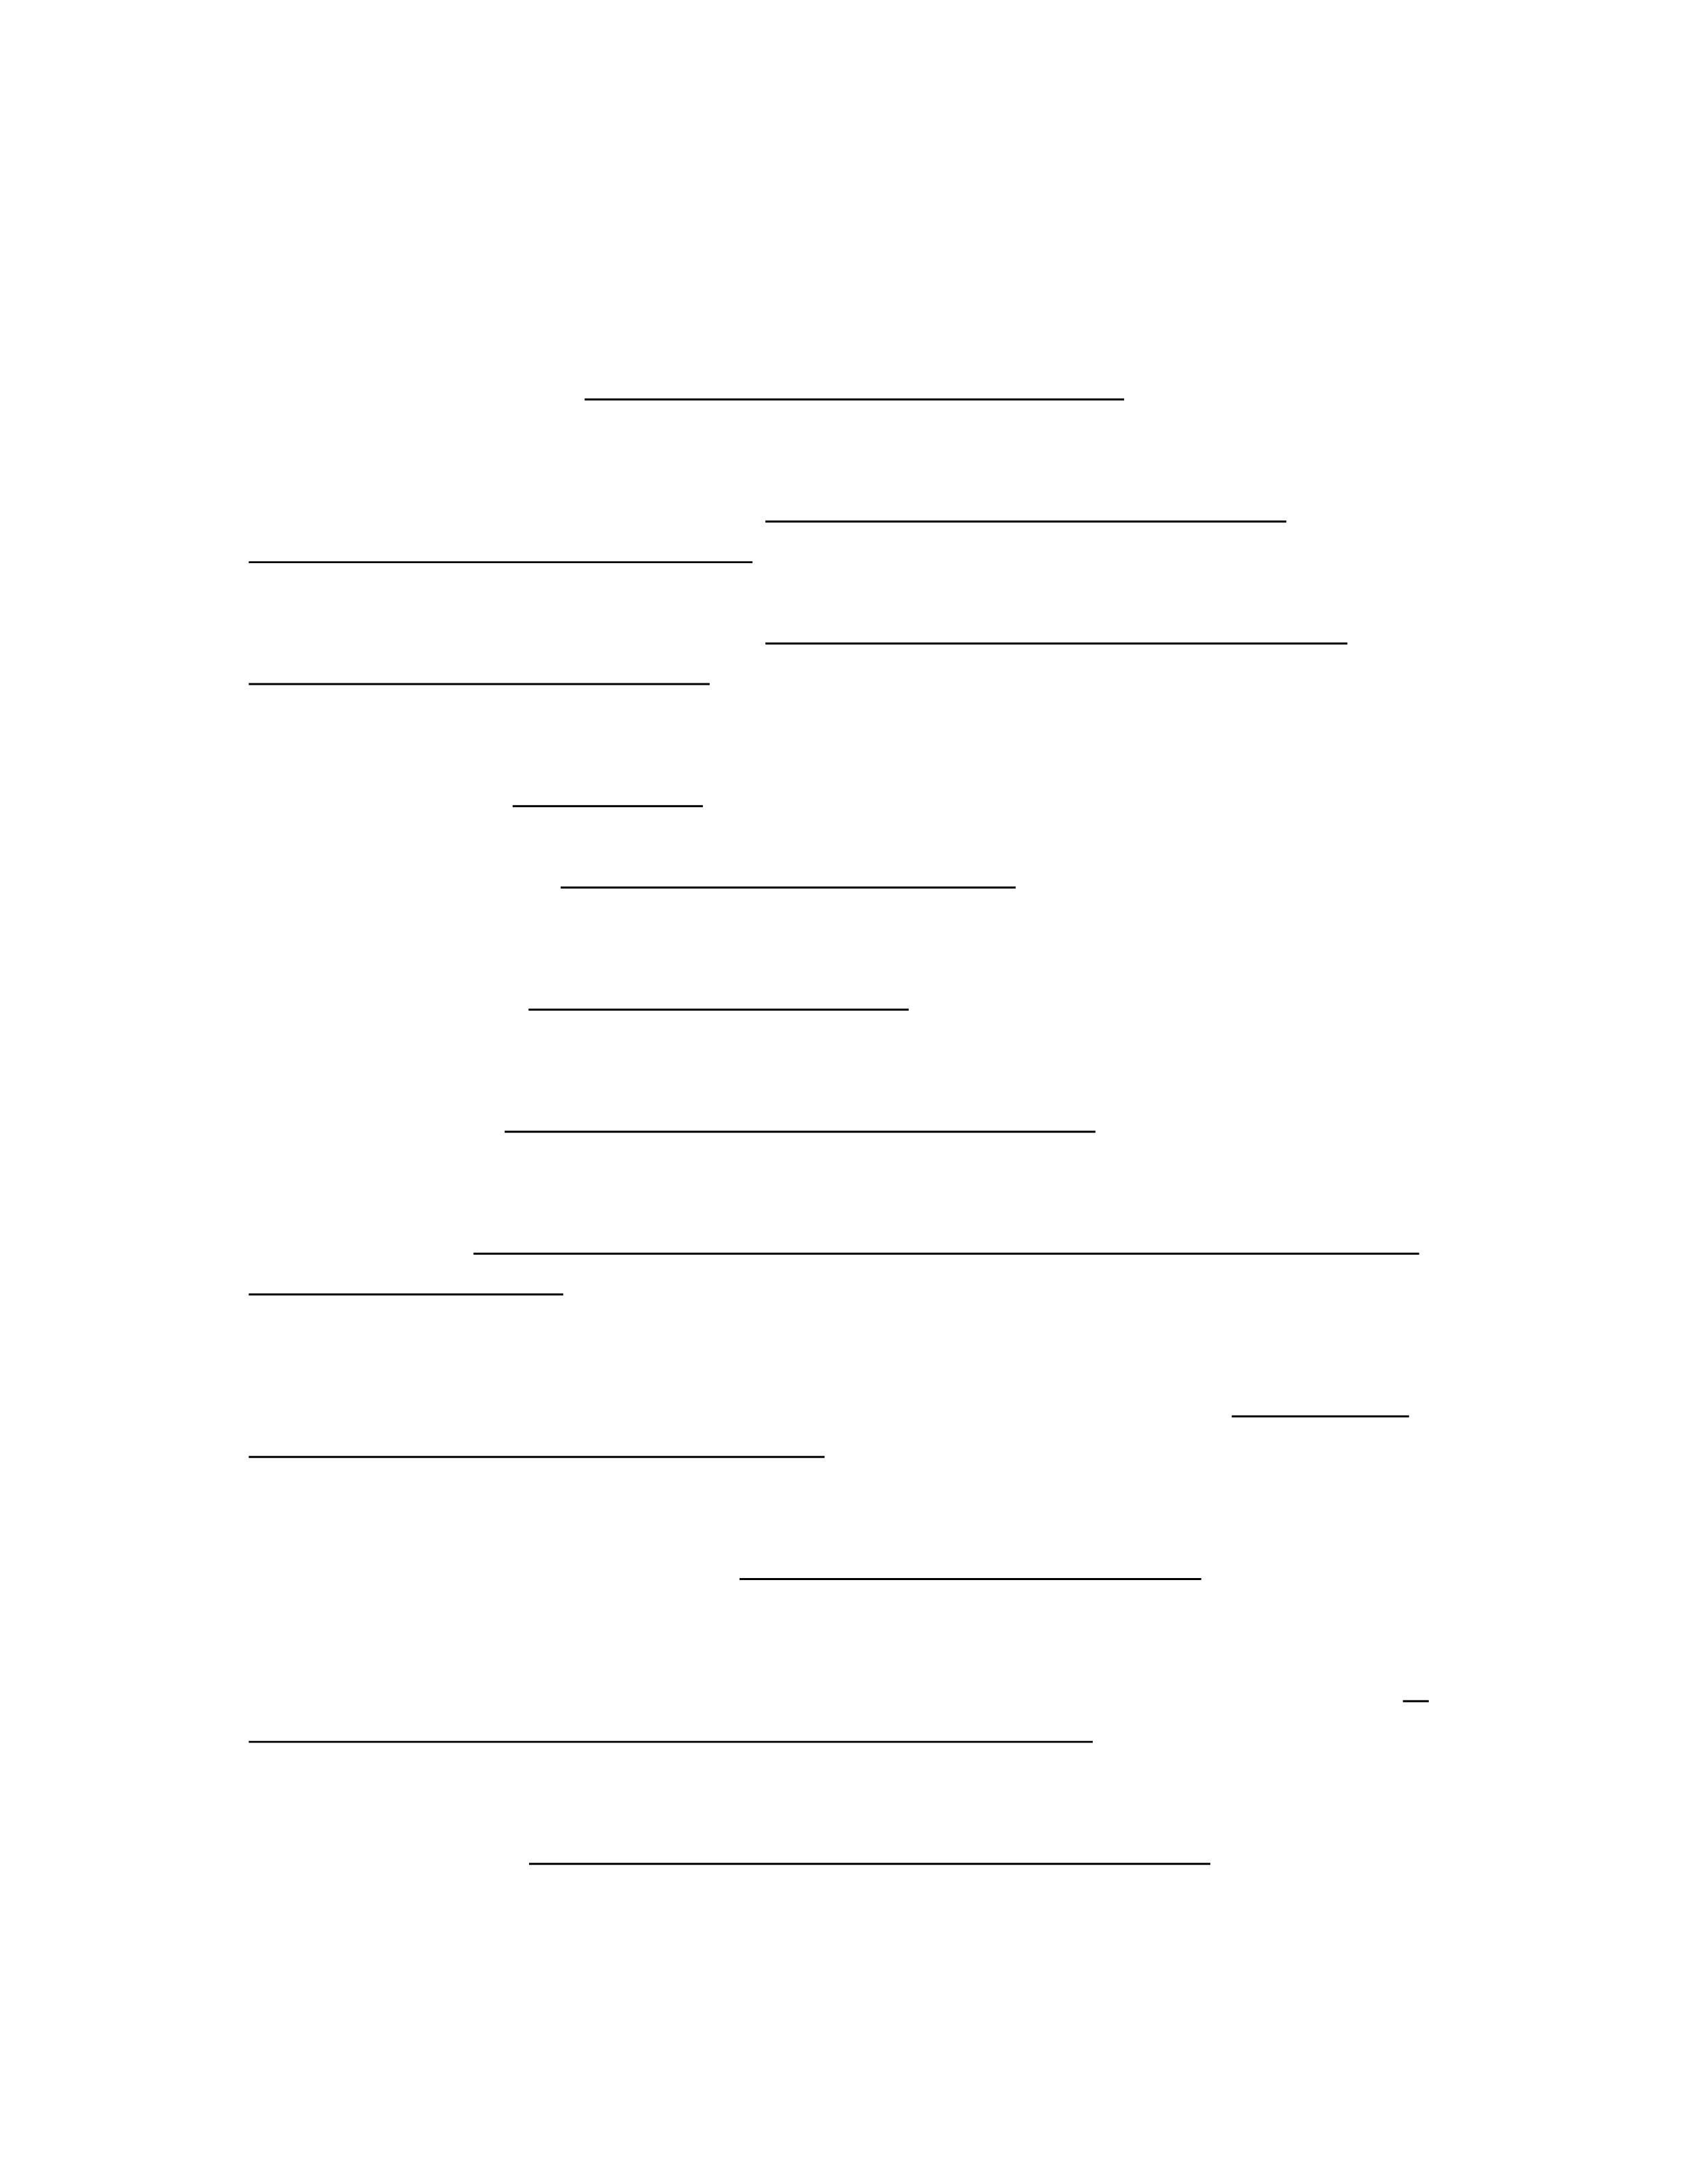 SSL_BTM_Exhibit_.pdf_36